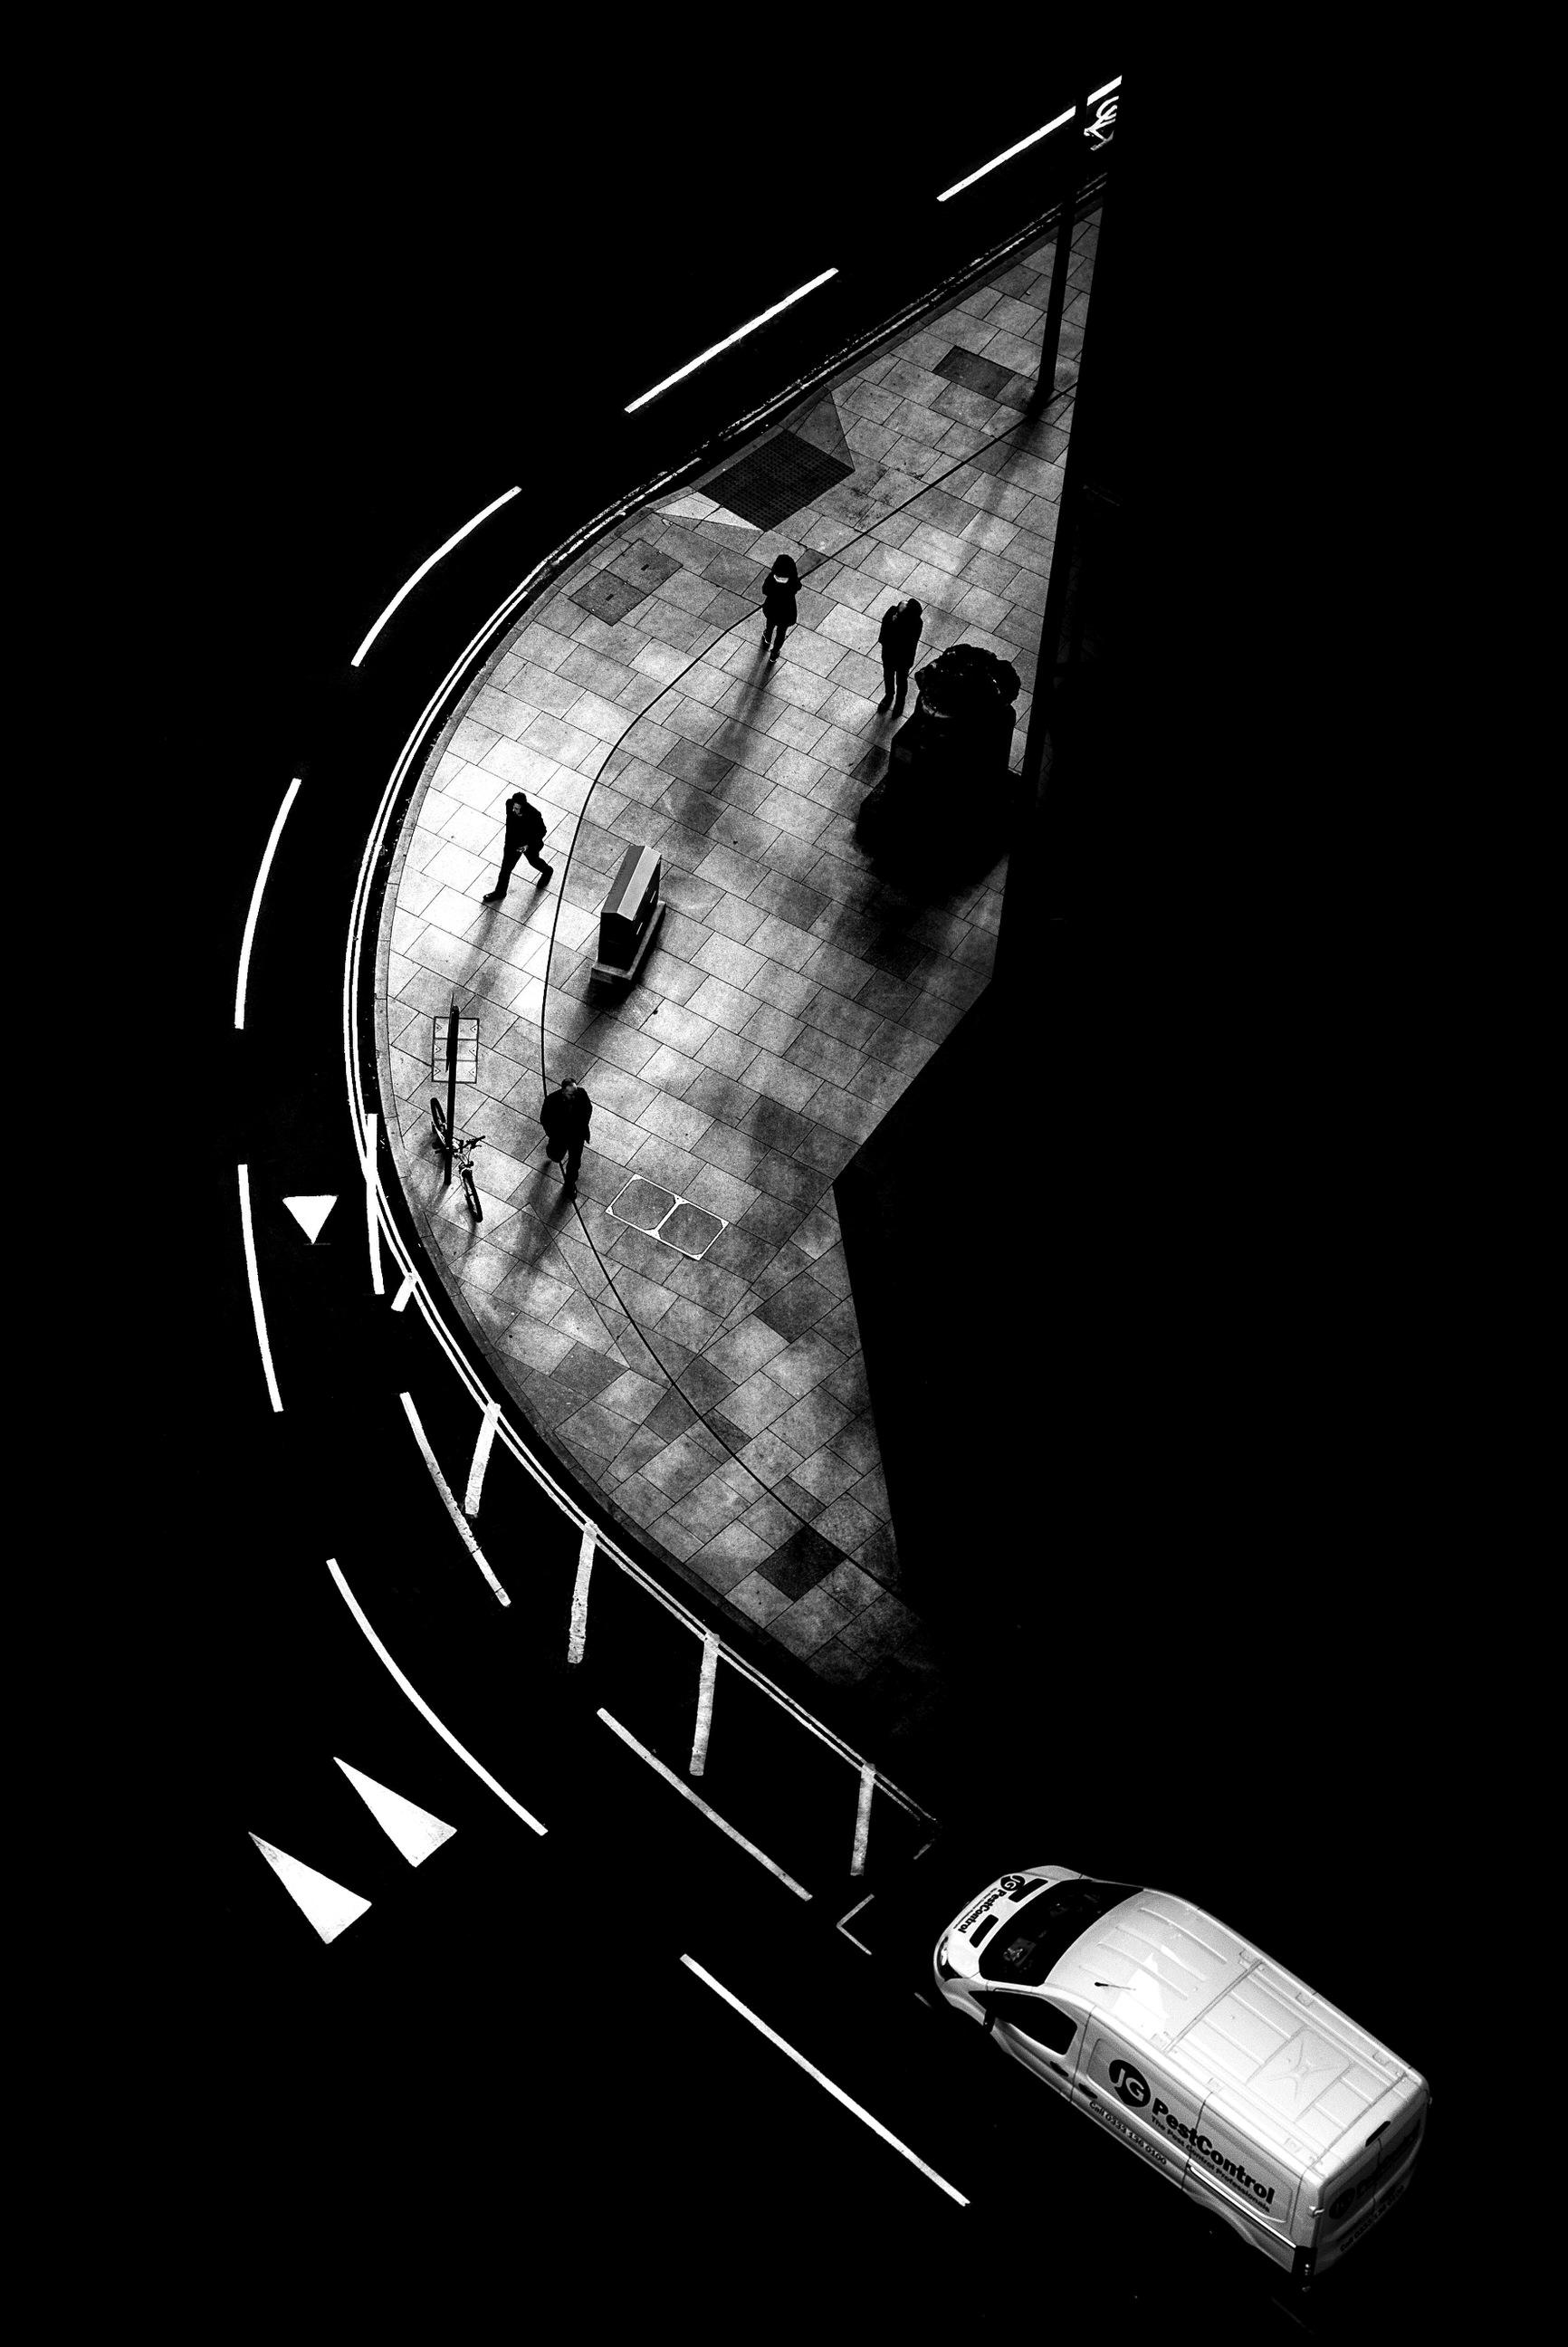 Alan Schaller - London Street Photographer - Metropolis1.jpg